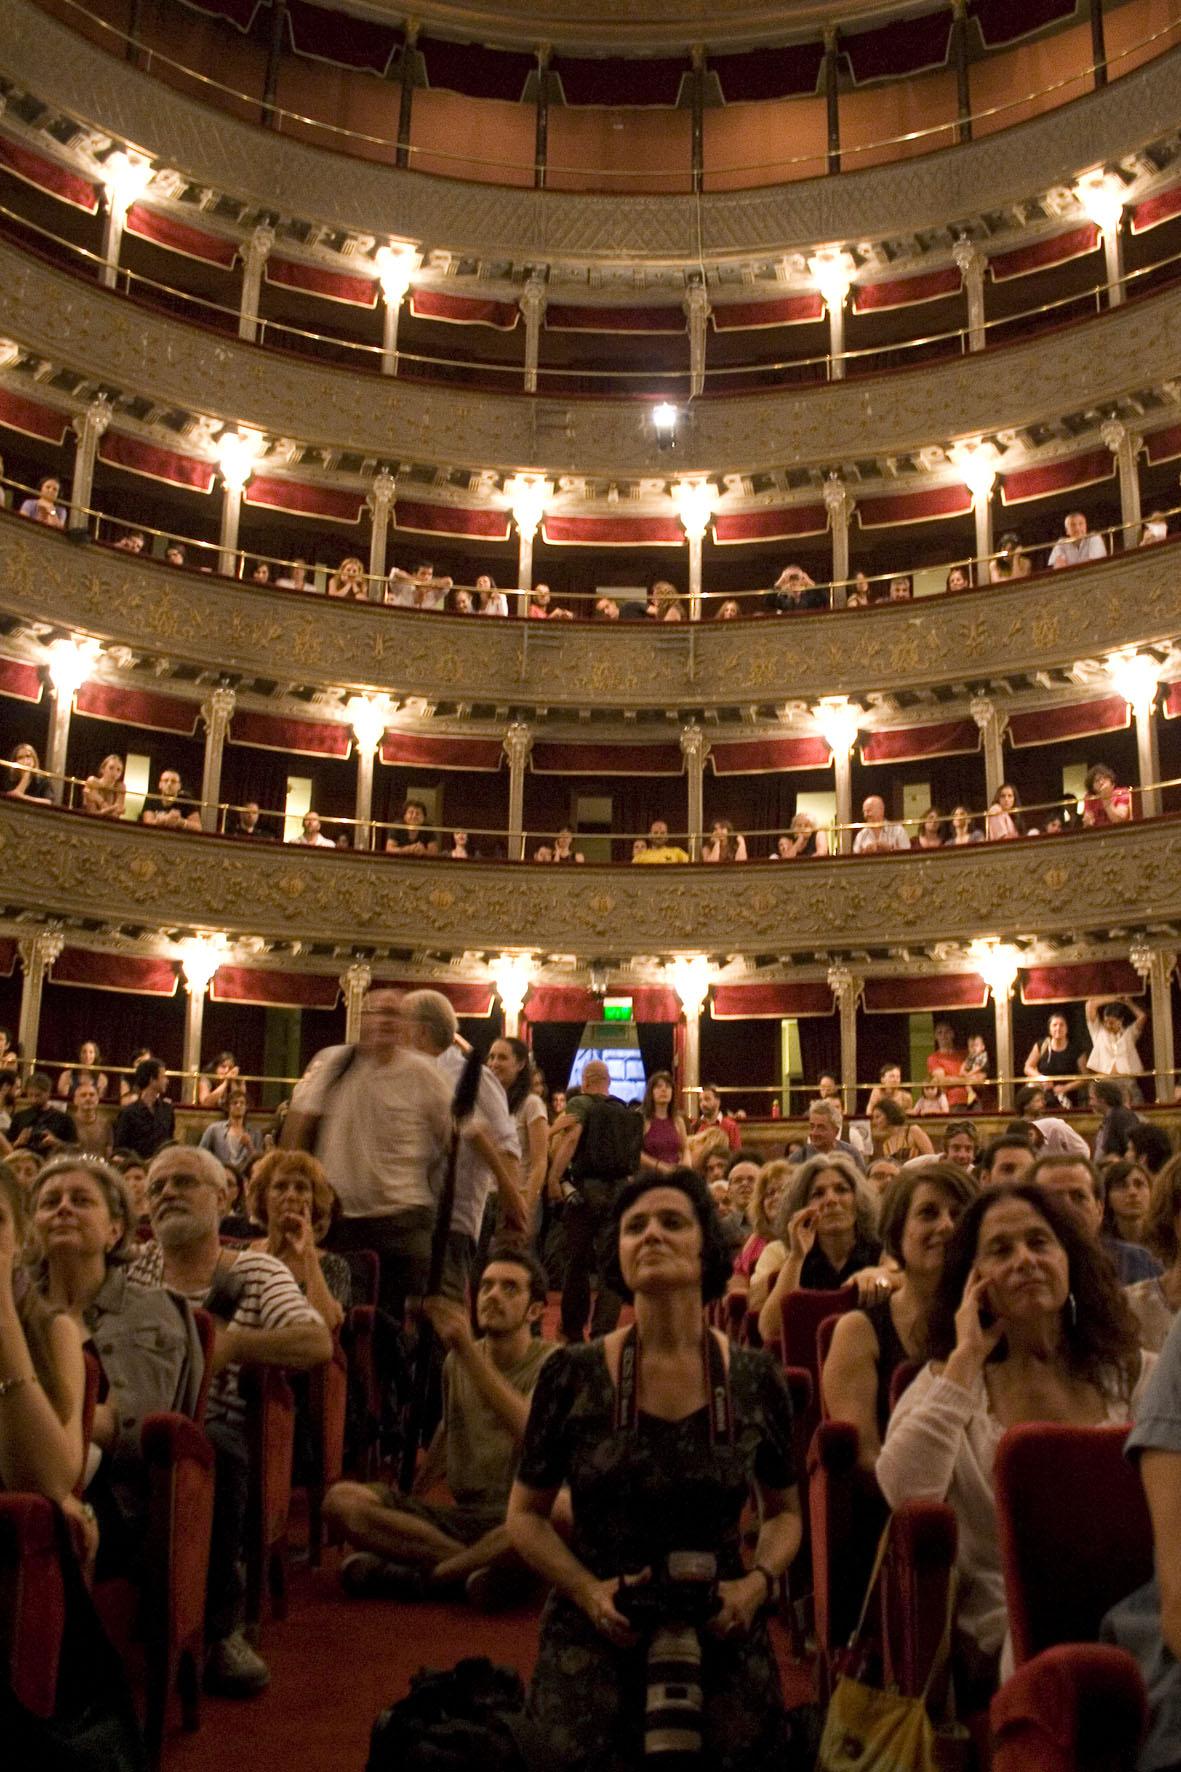 la platea gremita del Teatro Valle - photo by Luca Labanca